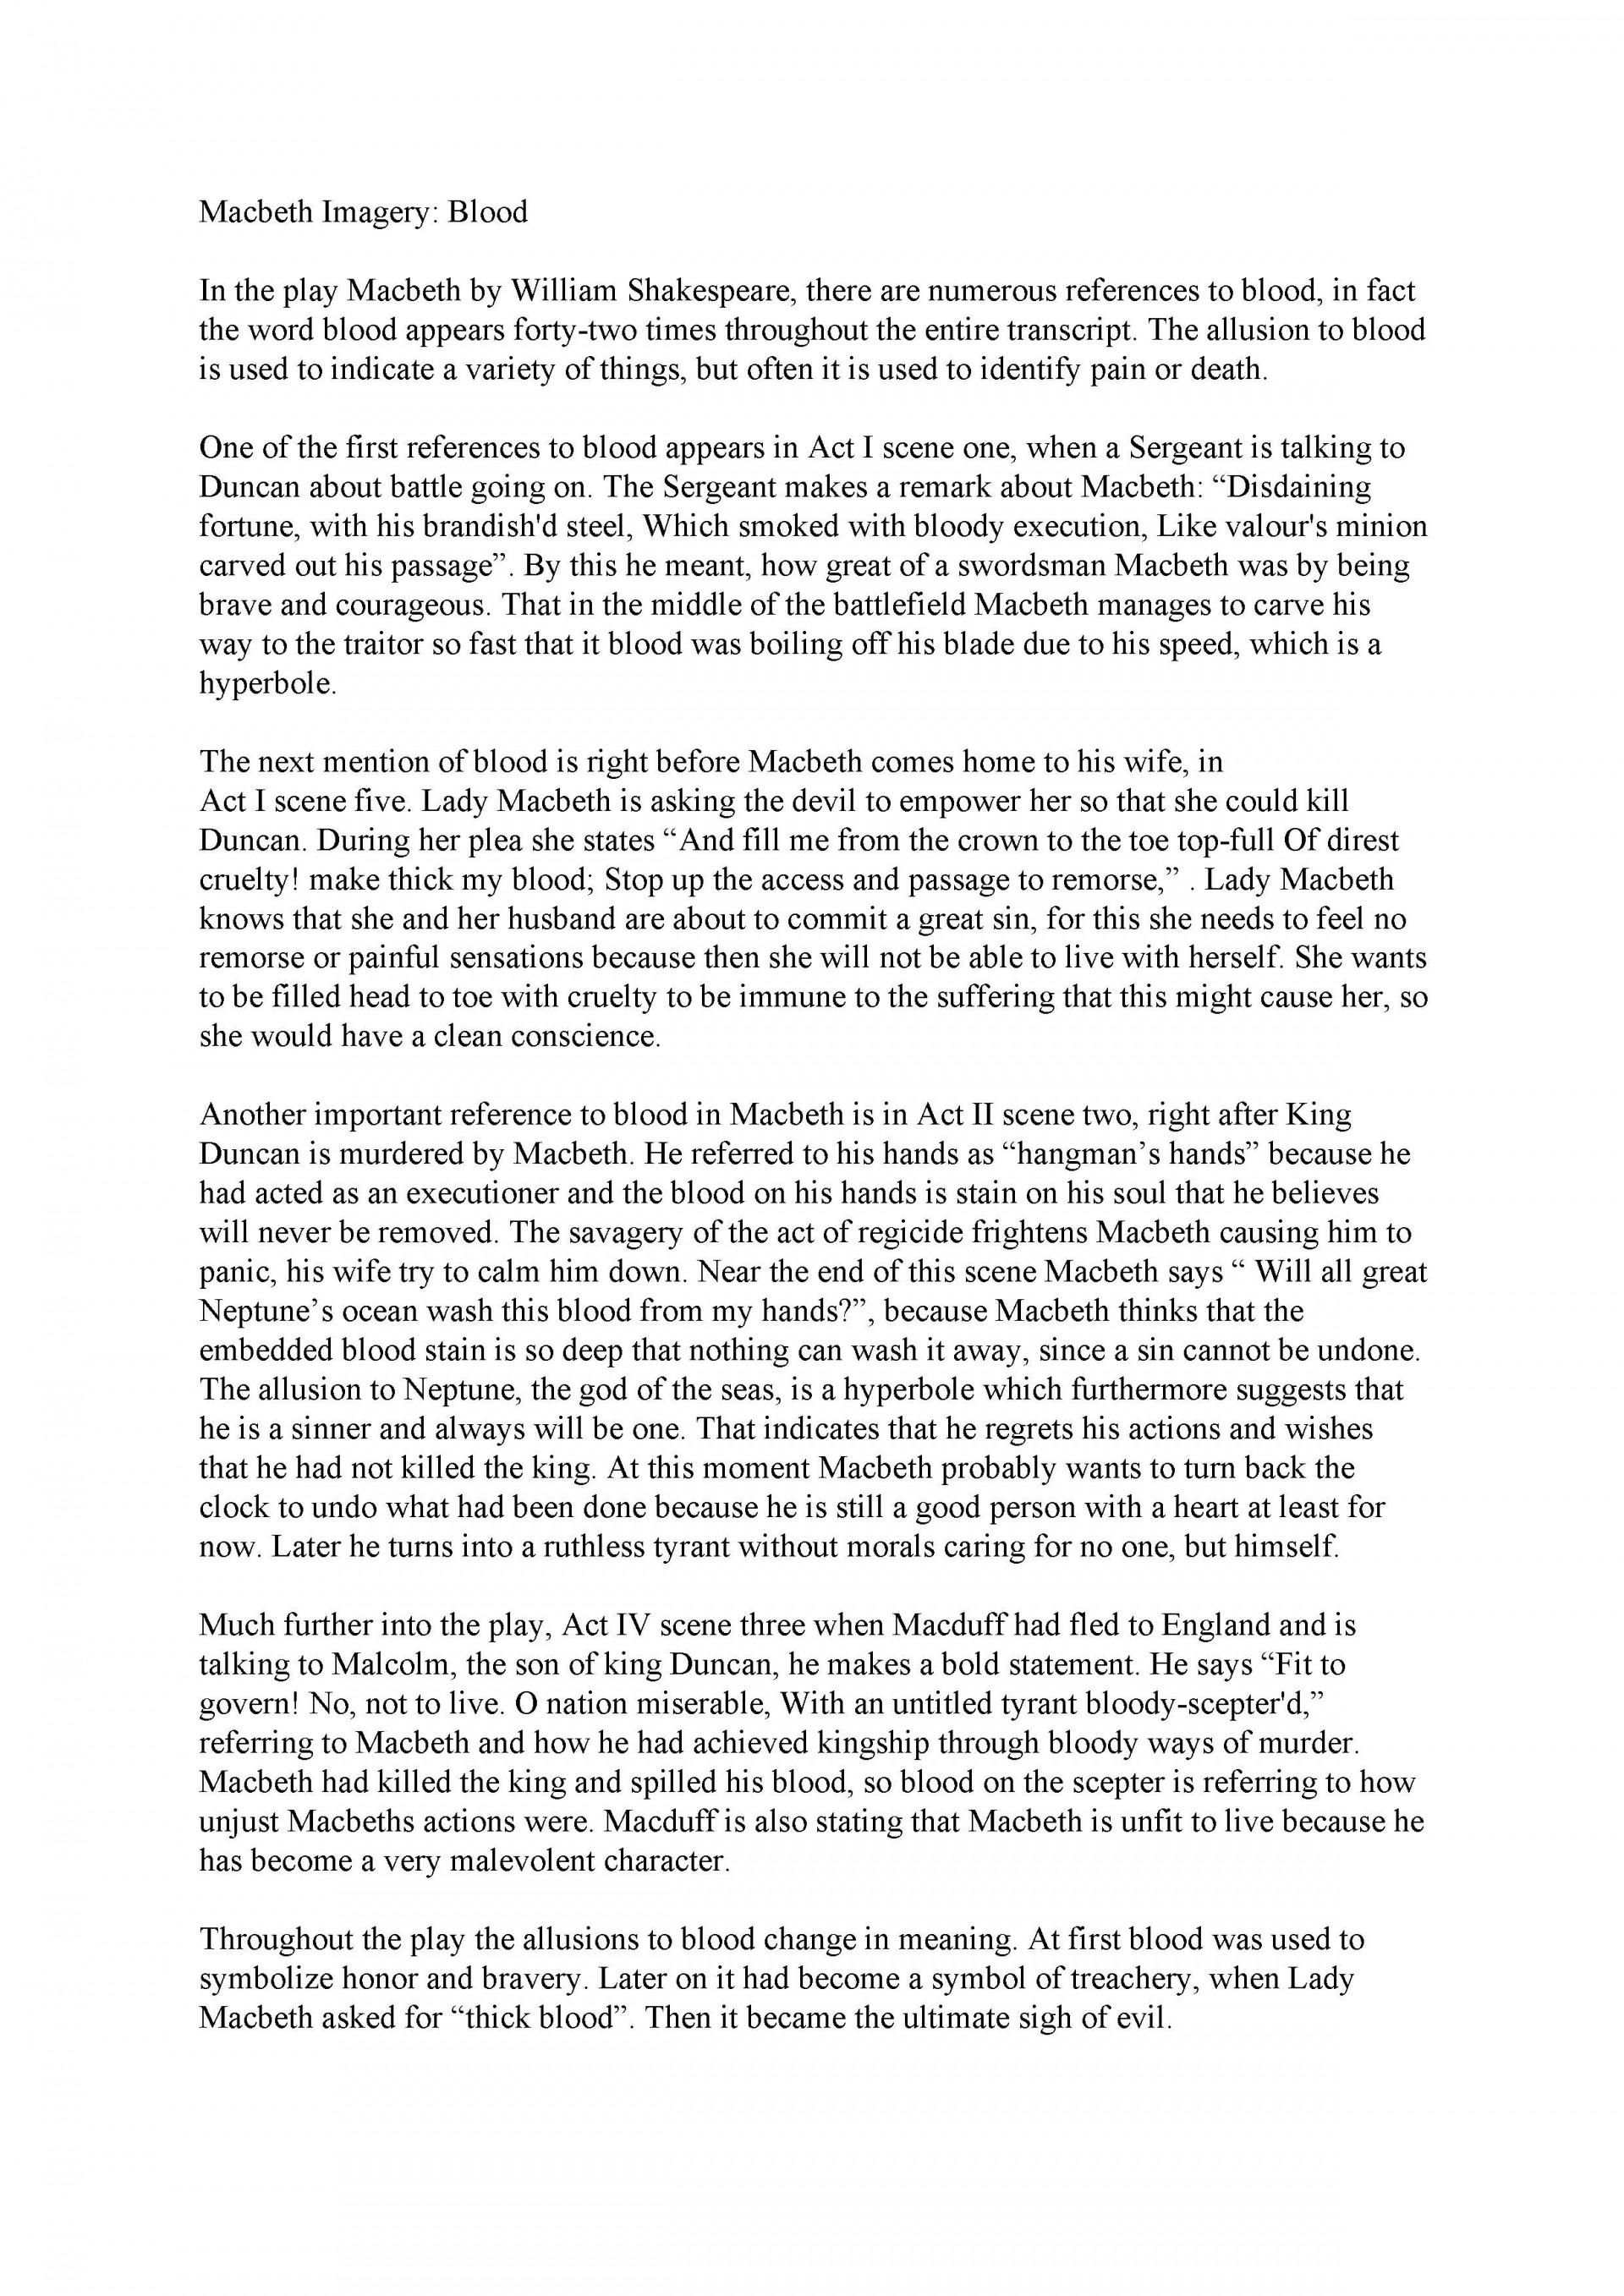 001 Macbeth Essay Sample Example Racism Surprising Examples 1920